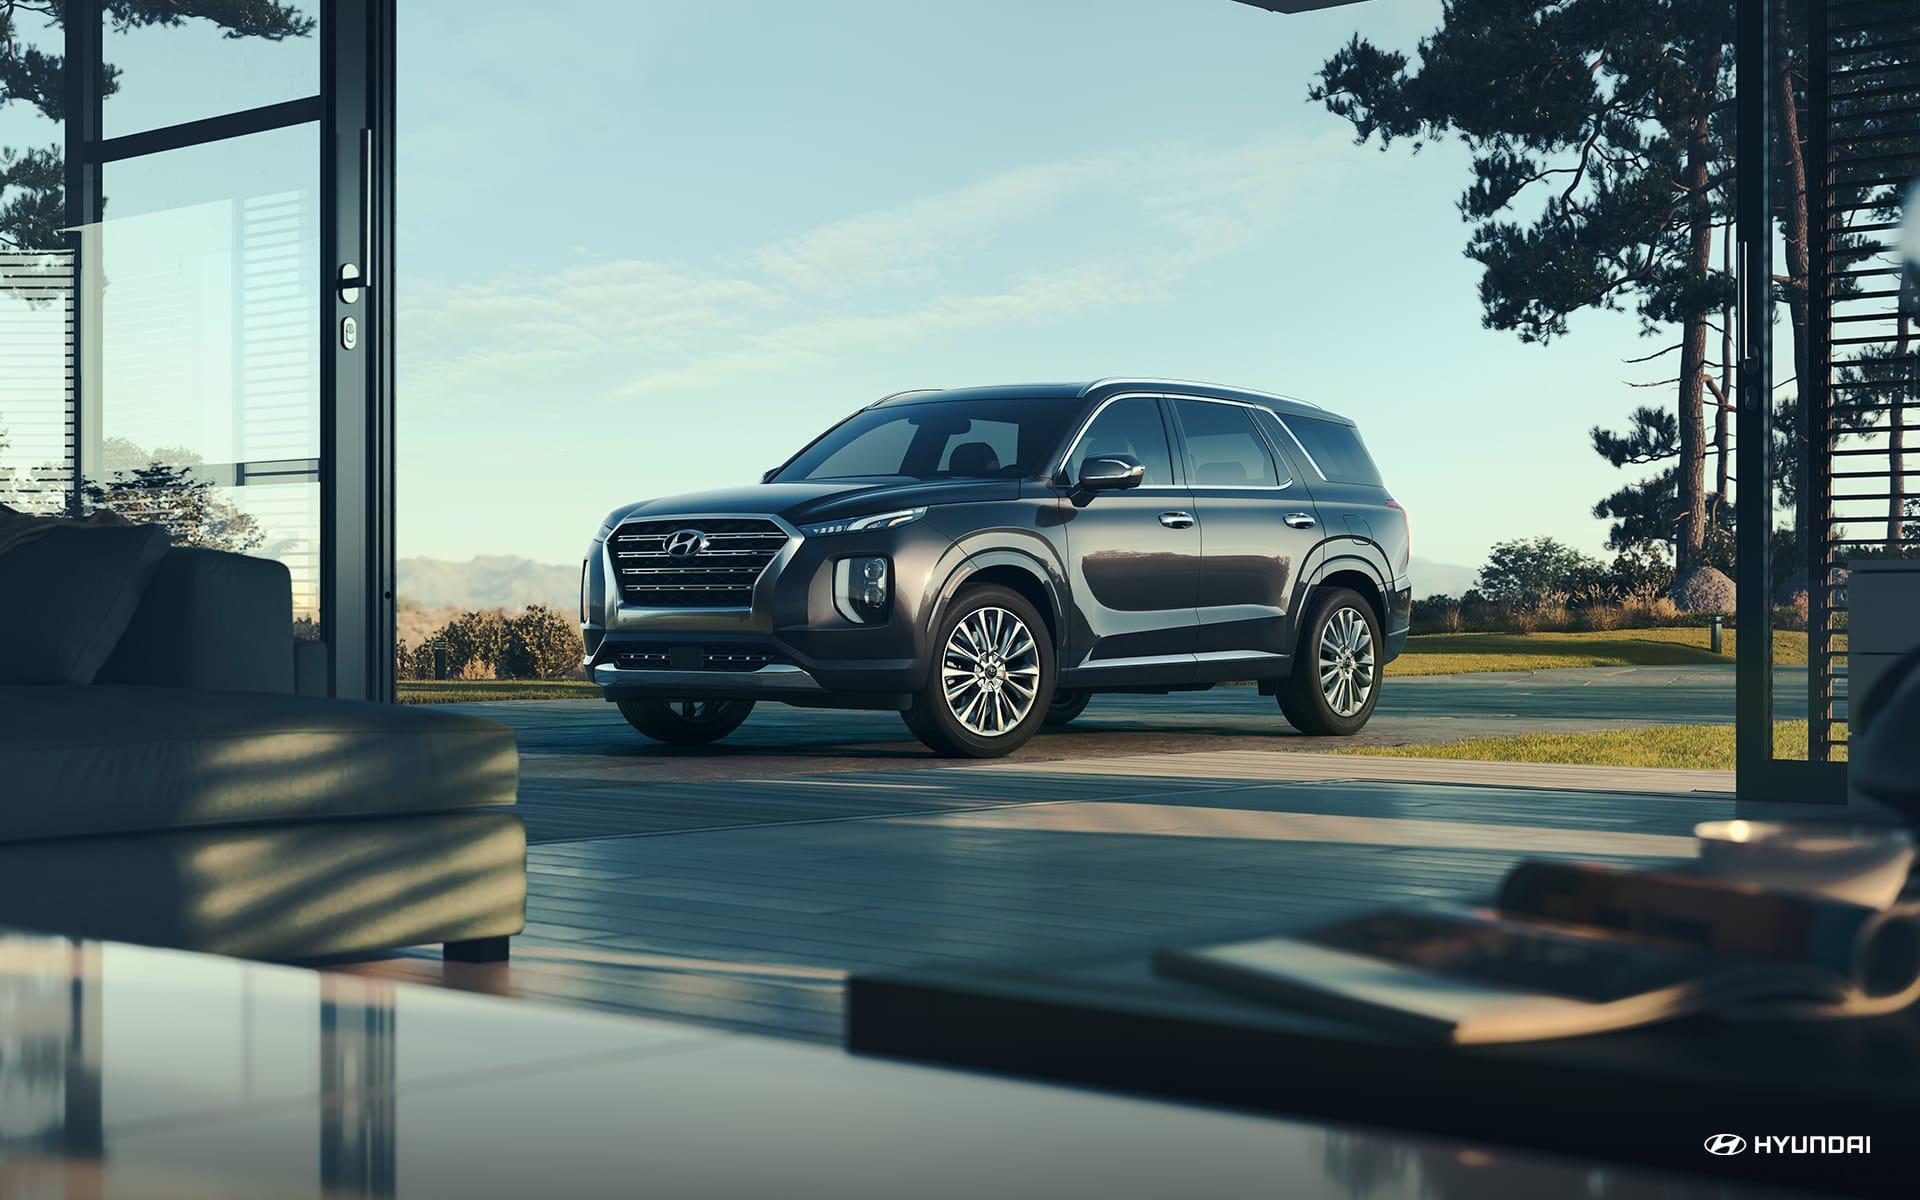 Hyundai Auto Financing near Orlando, FL